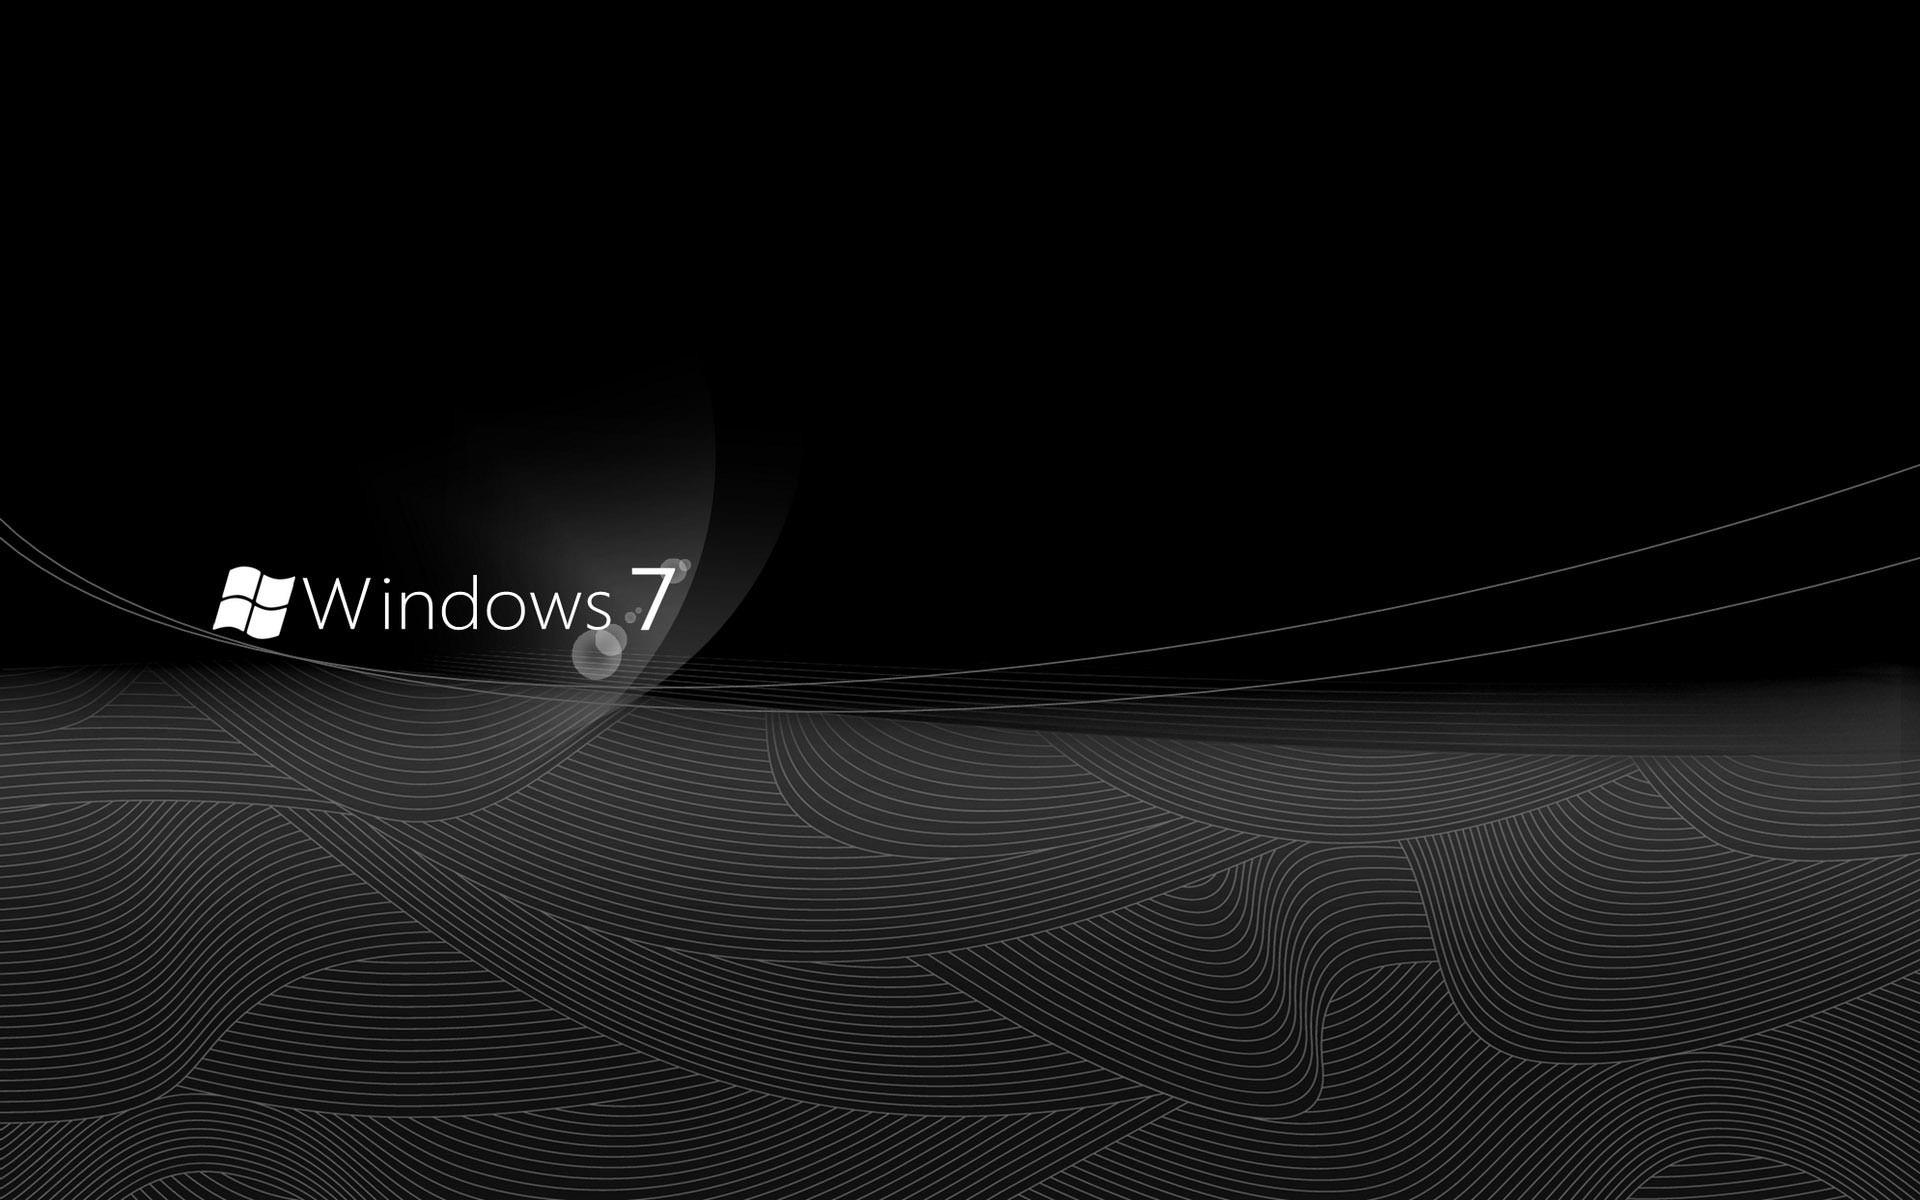 Change Desktop Background Windows Full Desktop Backgrounds 1600×1000 Windows  7 Desktop Backgrounds (48